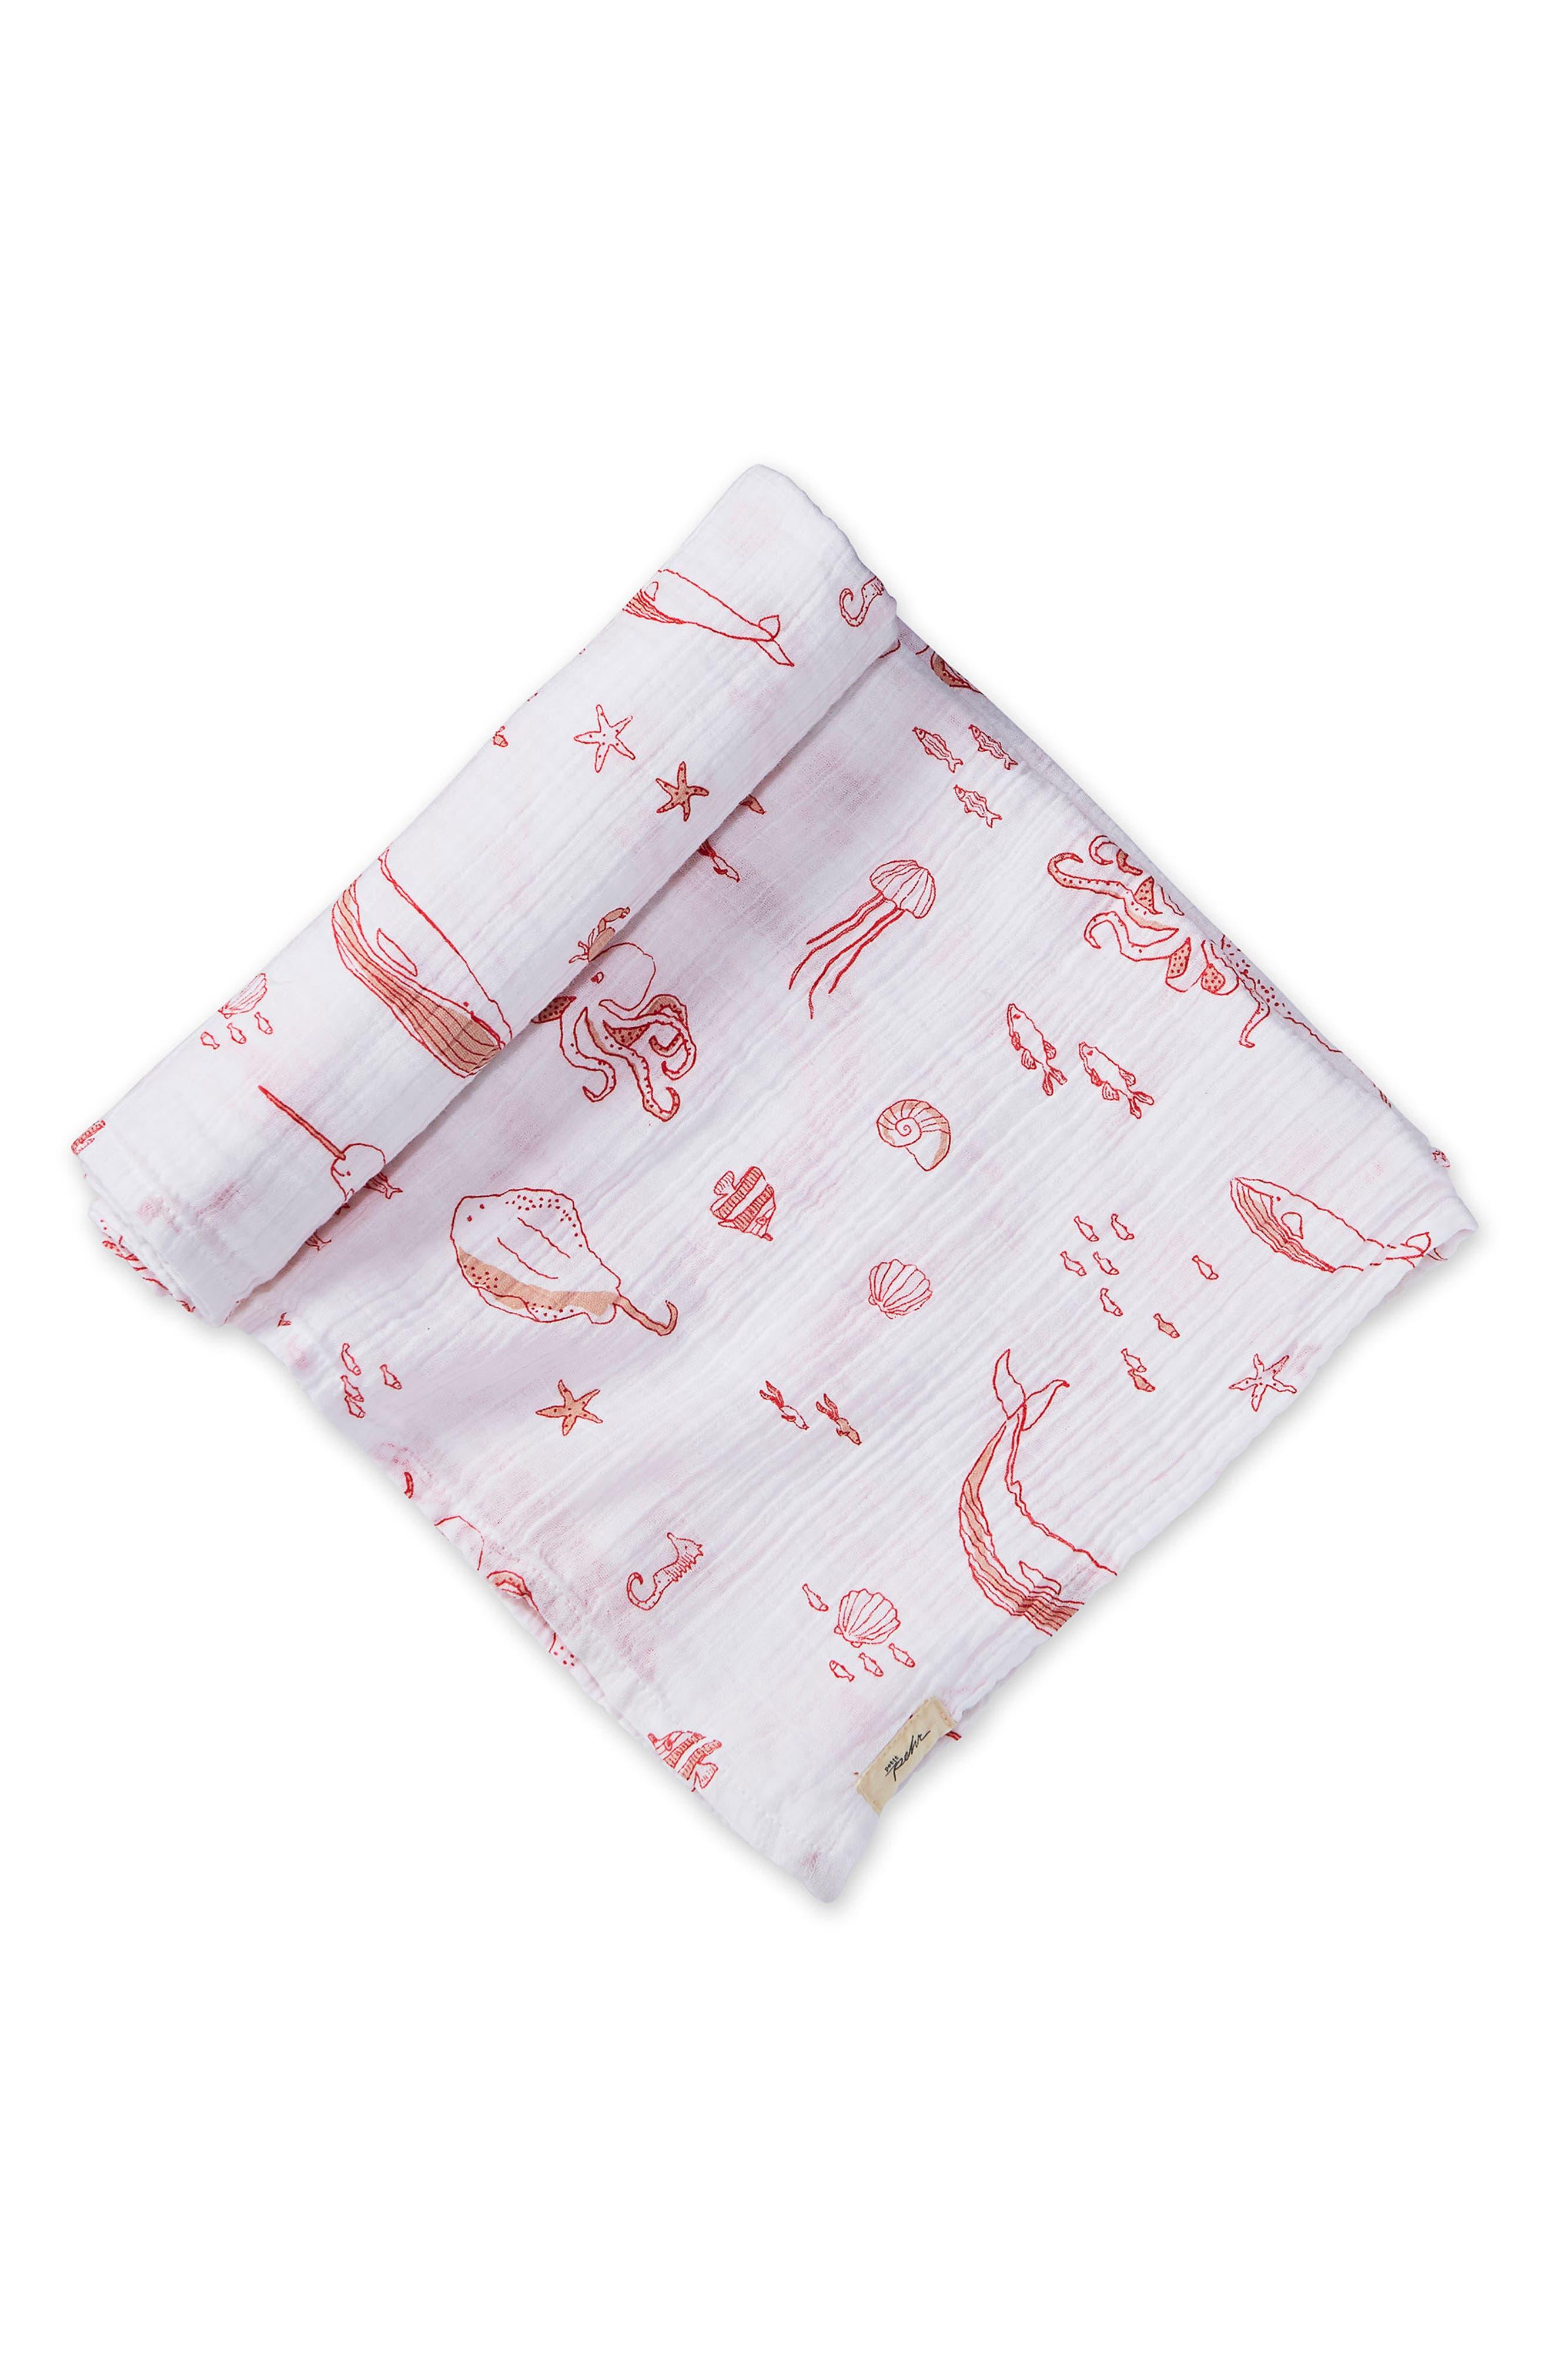 Life Aquatic Swaddle Blanket,                         Main,                         color, GRAPEFRUIT PINK